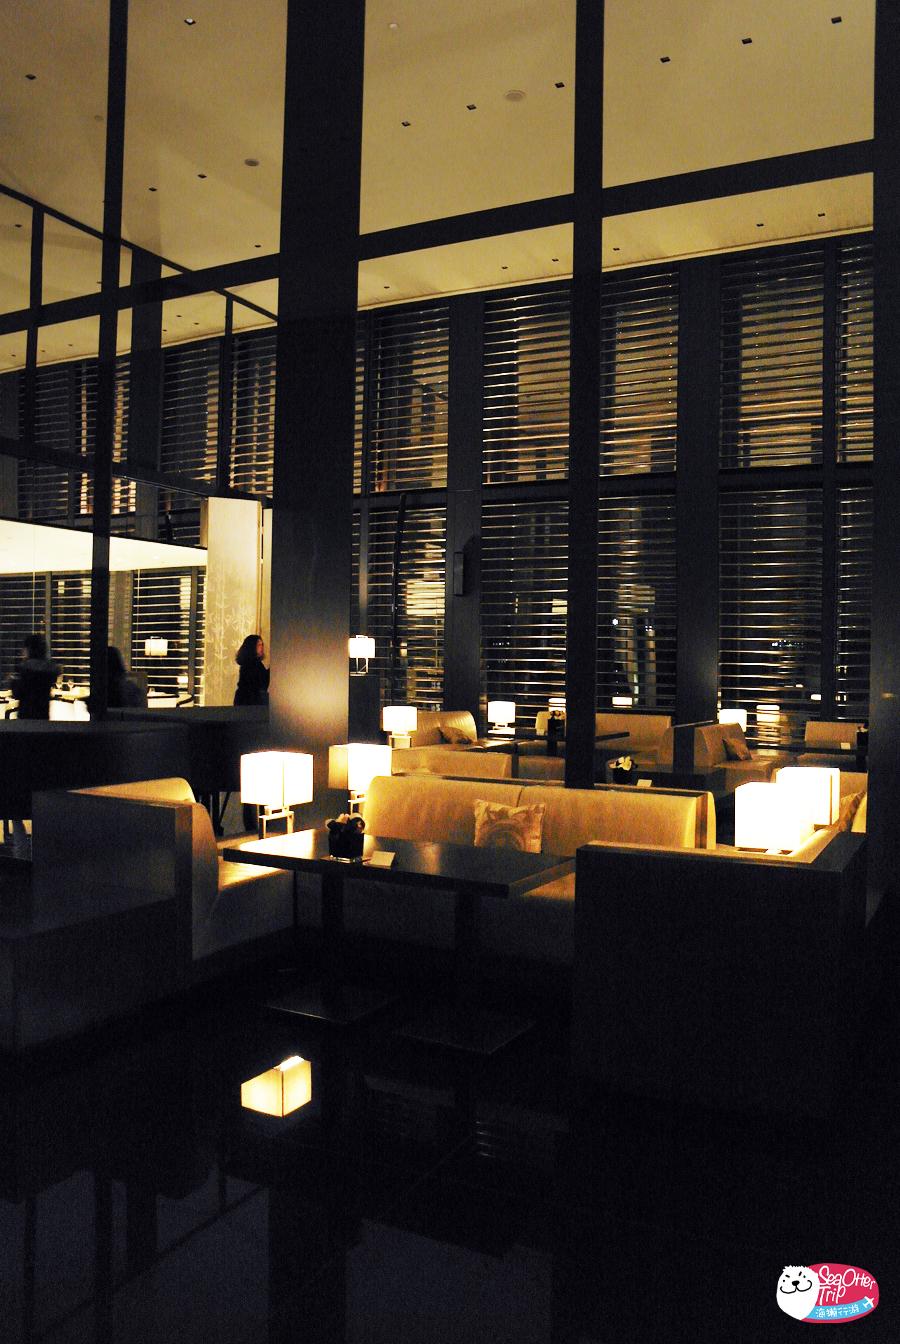 Armani hotel阿曼尼酒店大使套房及米其林大師晚餐